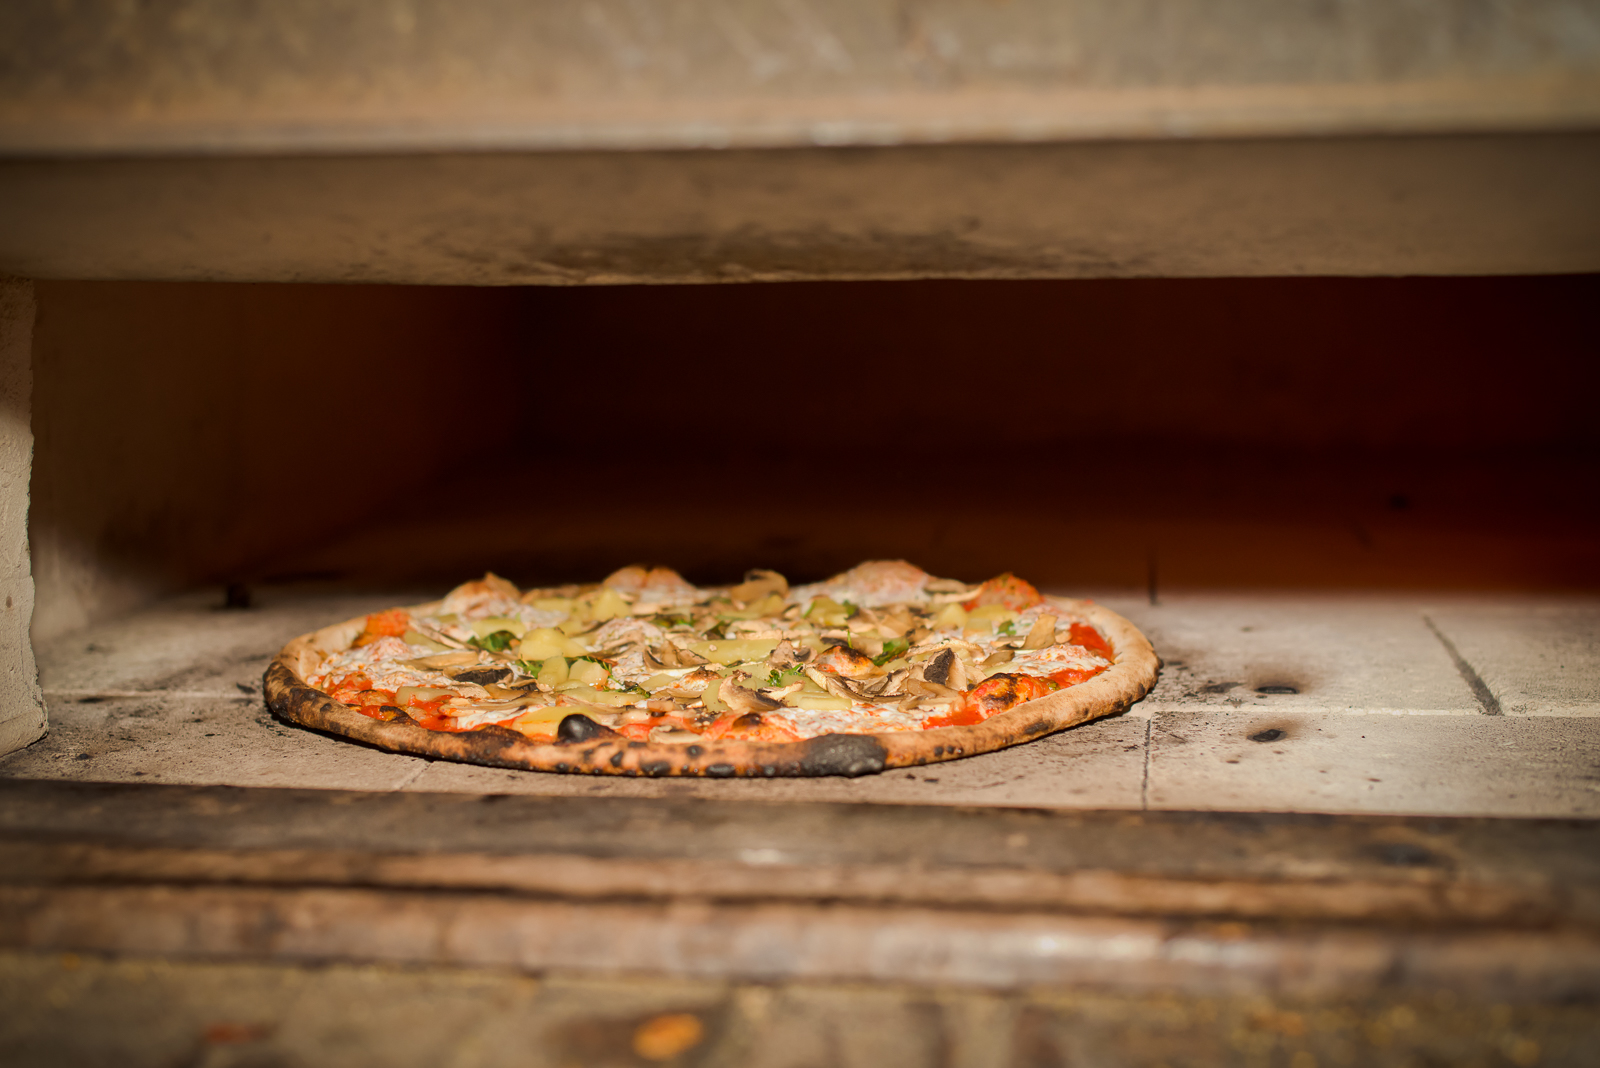 sacs-place-coal-oven-pizza-italian-restaurant-astoria-queens-cooking.jpg